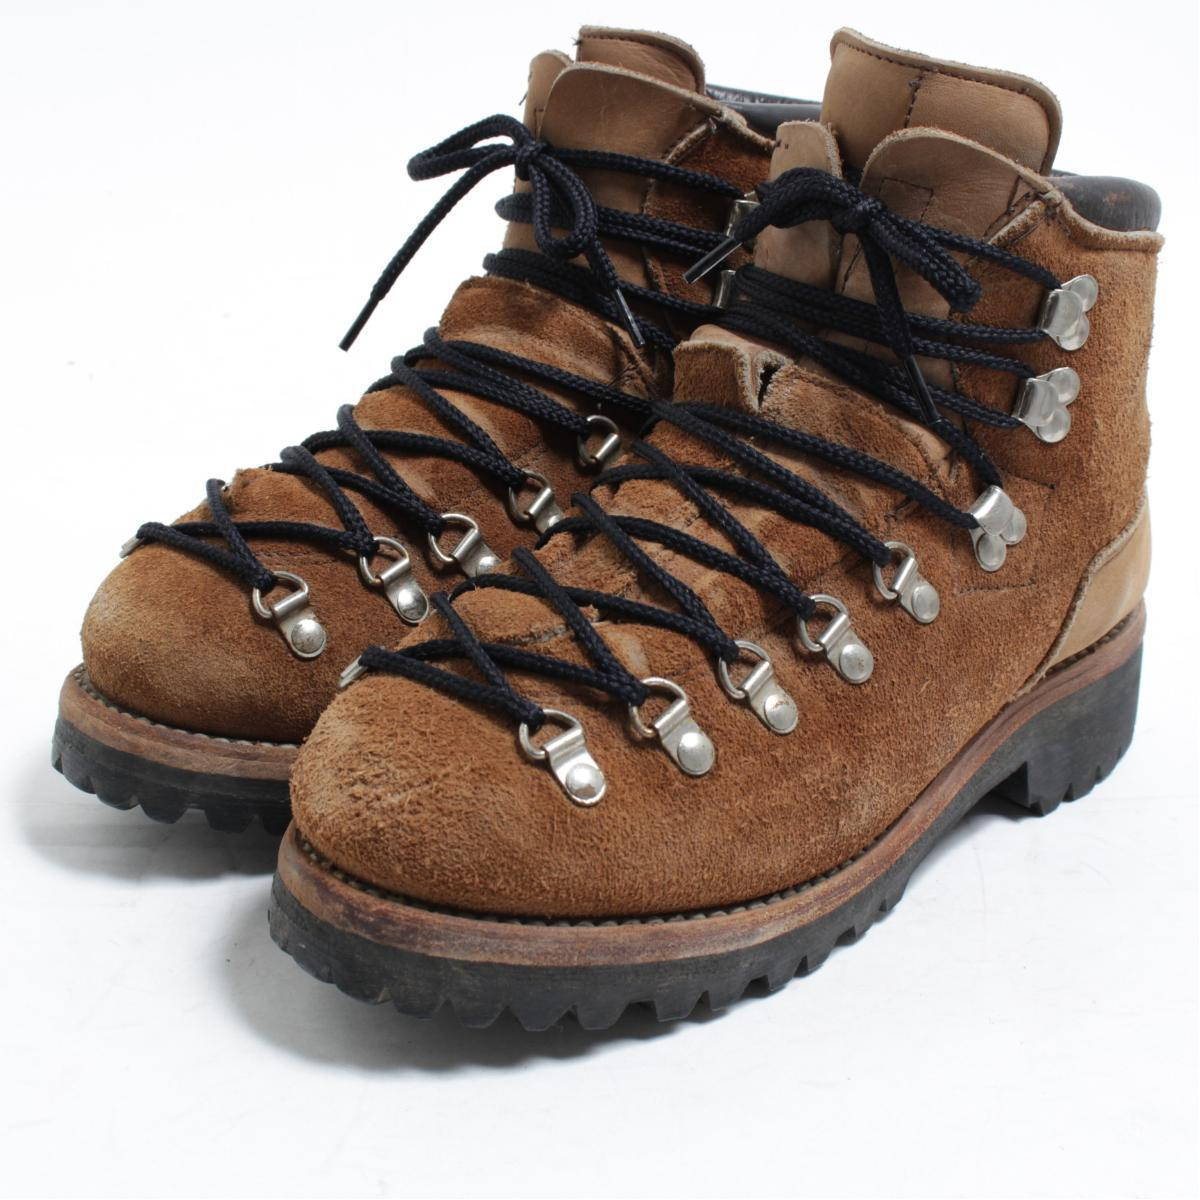 28817d002af9d 8M men 26.0cm /bom7047 made in Dexter Dexter mountain boots USA